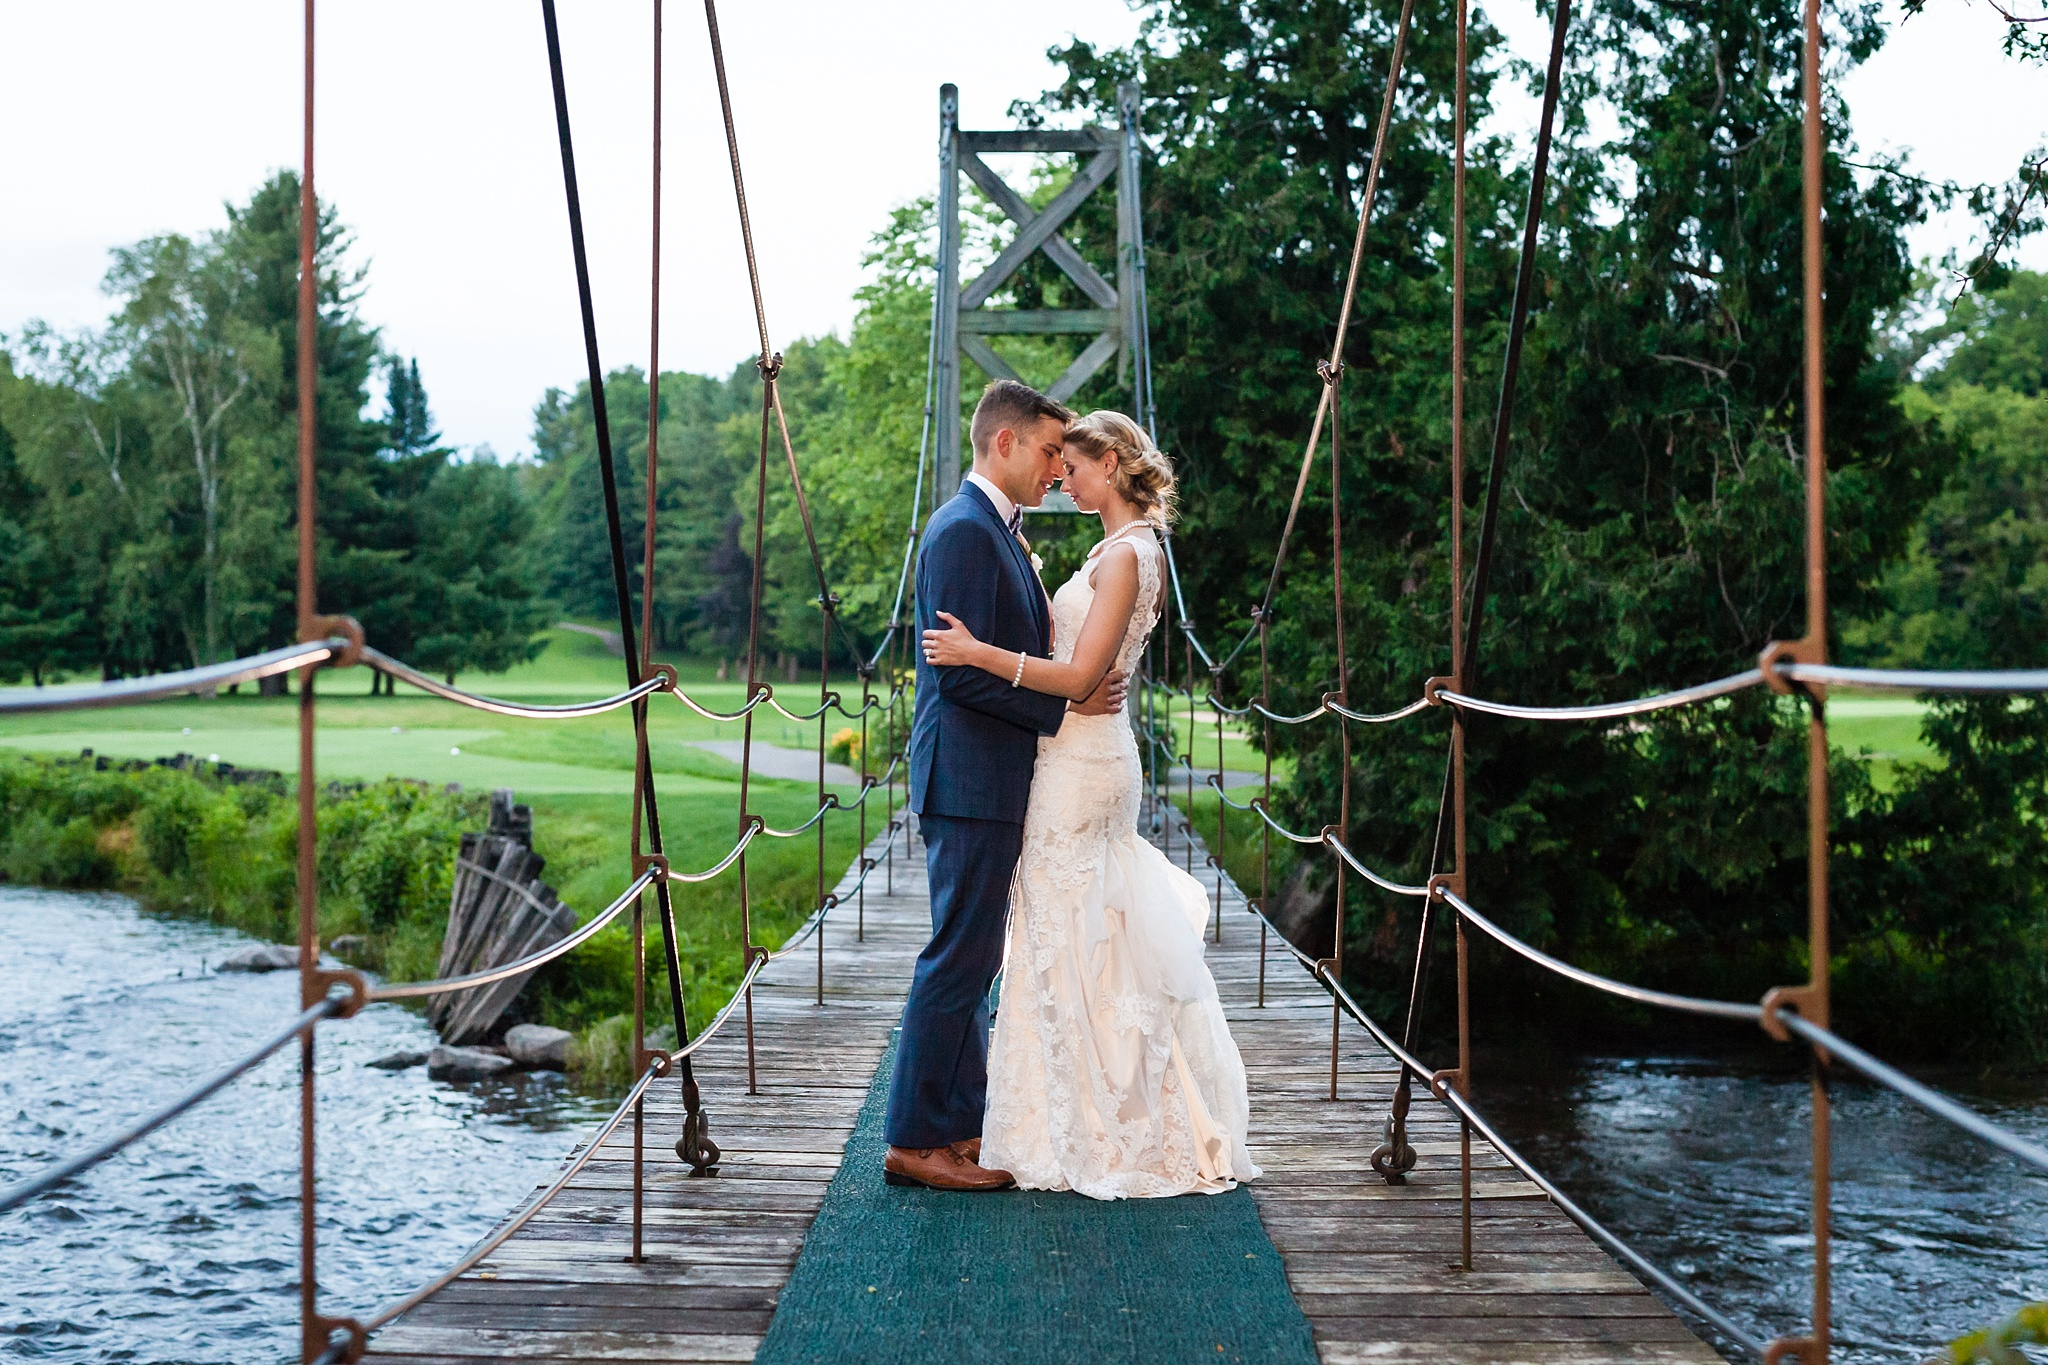 Becky_Cameron_Grand_Rapids_Blythefield Country_Club_Wedding064.JPG